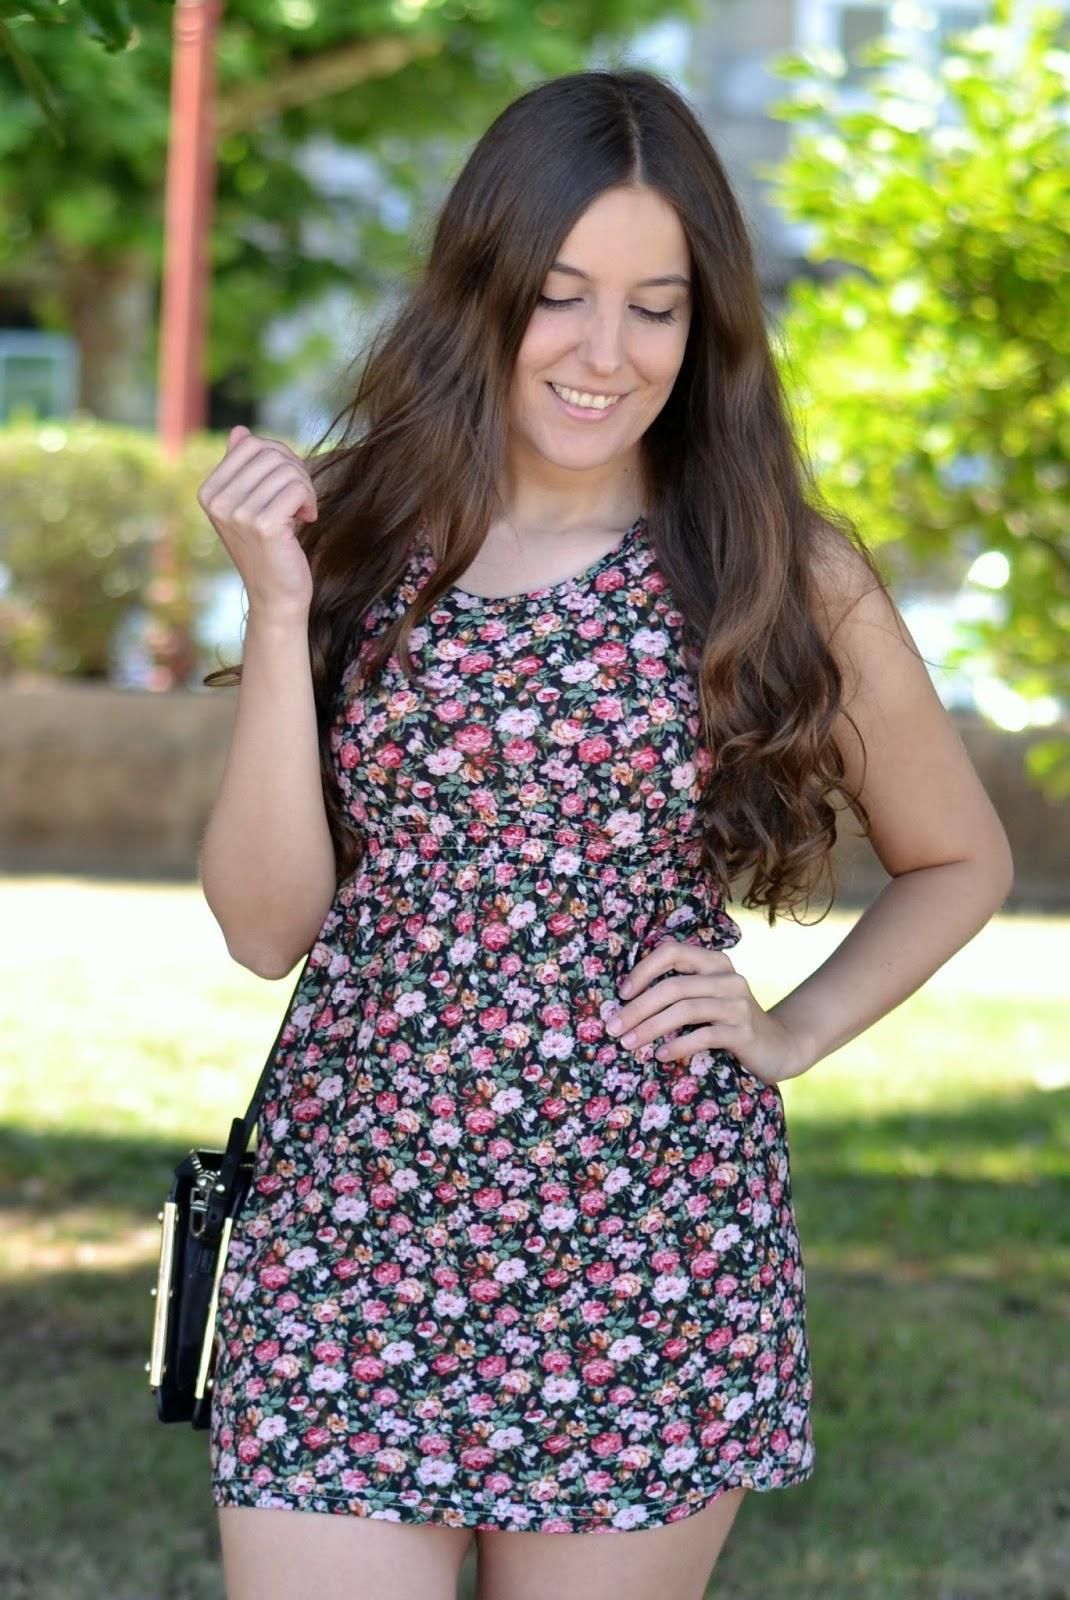 vestido flores cndirect